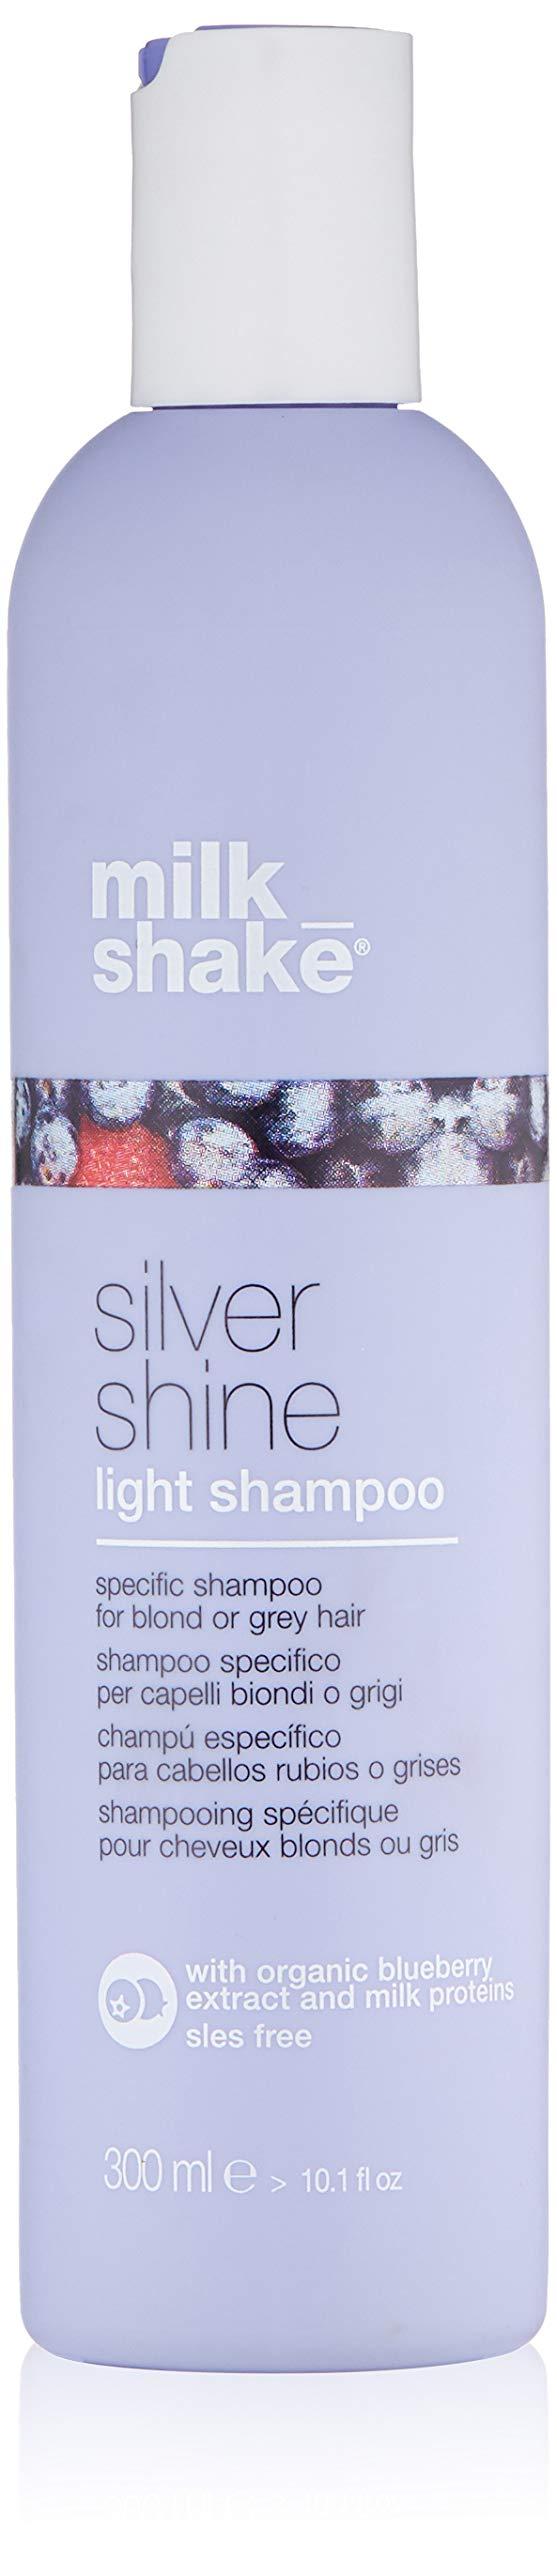 milk_shake Silver Shine Light Shampoo, 10.1 Fl Oz by milk_shake